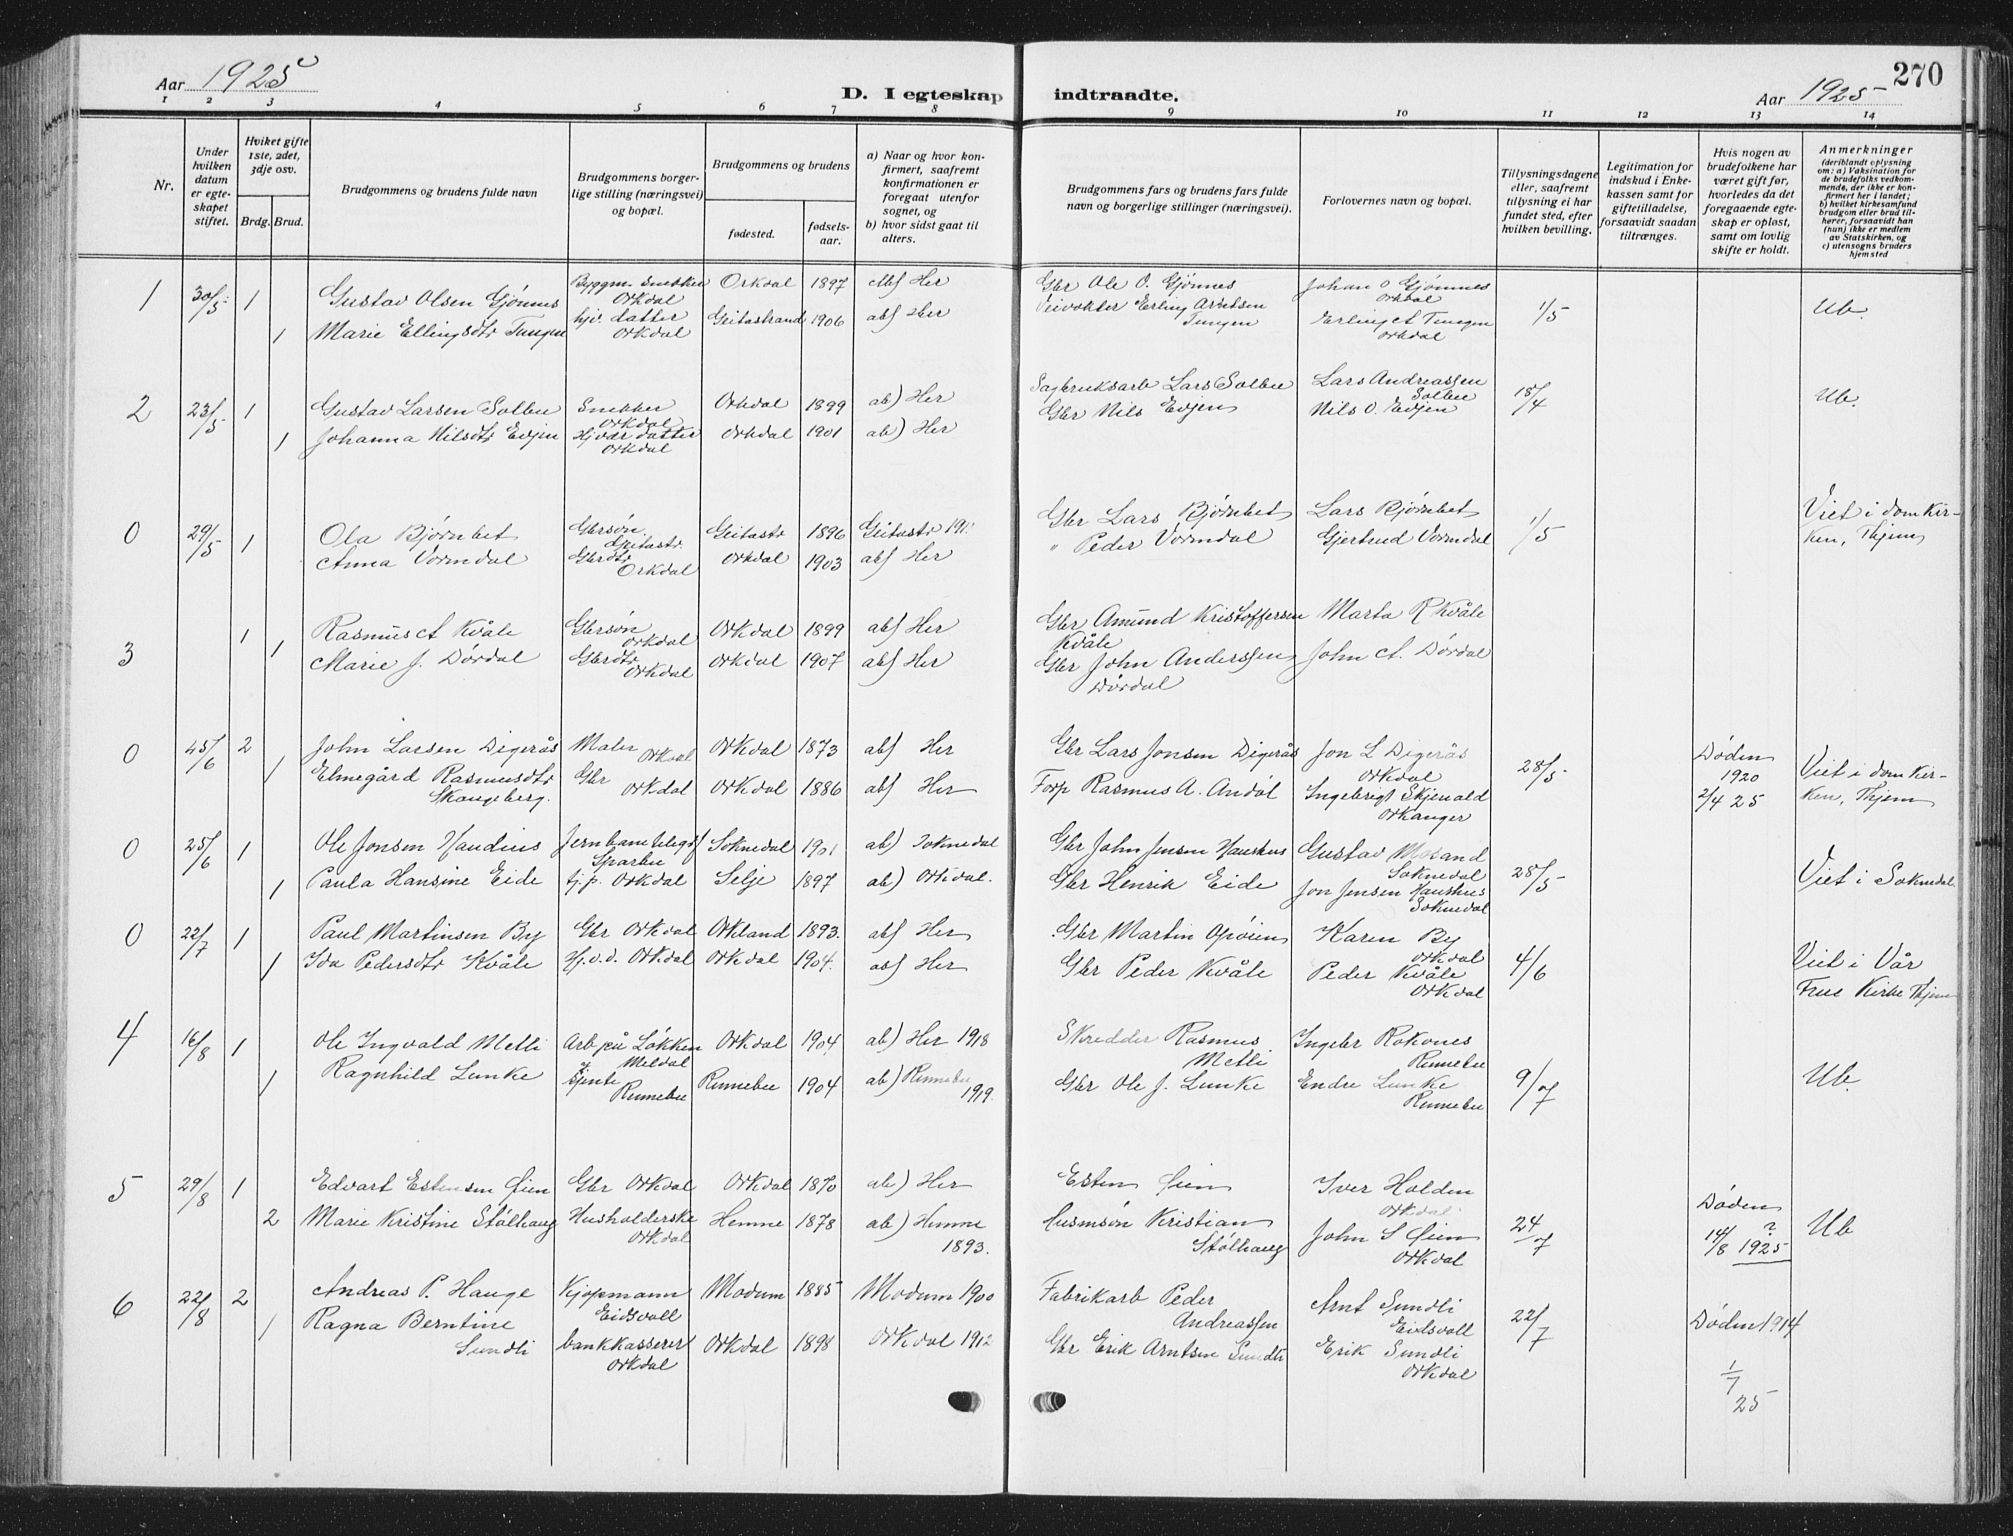 SAT, Ministerialprotokoller, klokkerbøker og fødselsregistre - Sør-Trøndelag, 668/L0820: Parish register (copy) no. 668C09, 1912-1936, p. 270